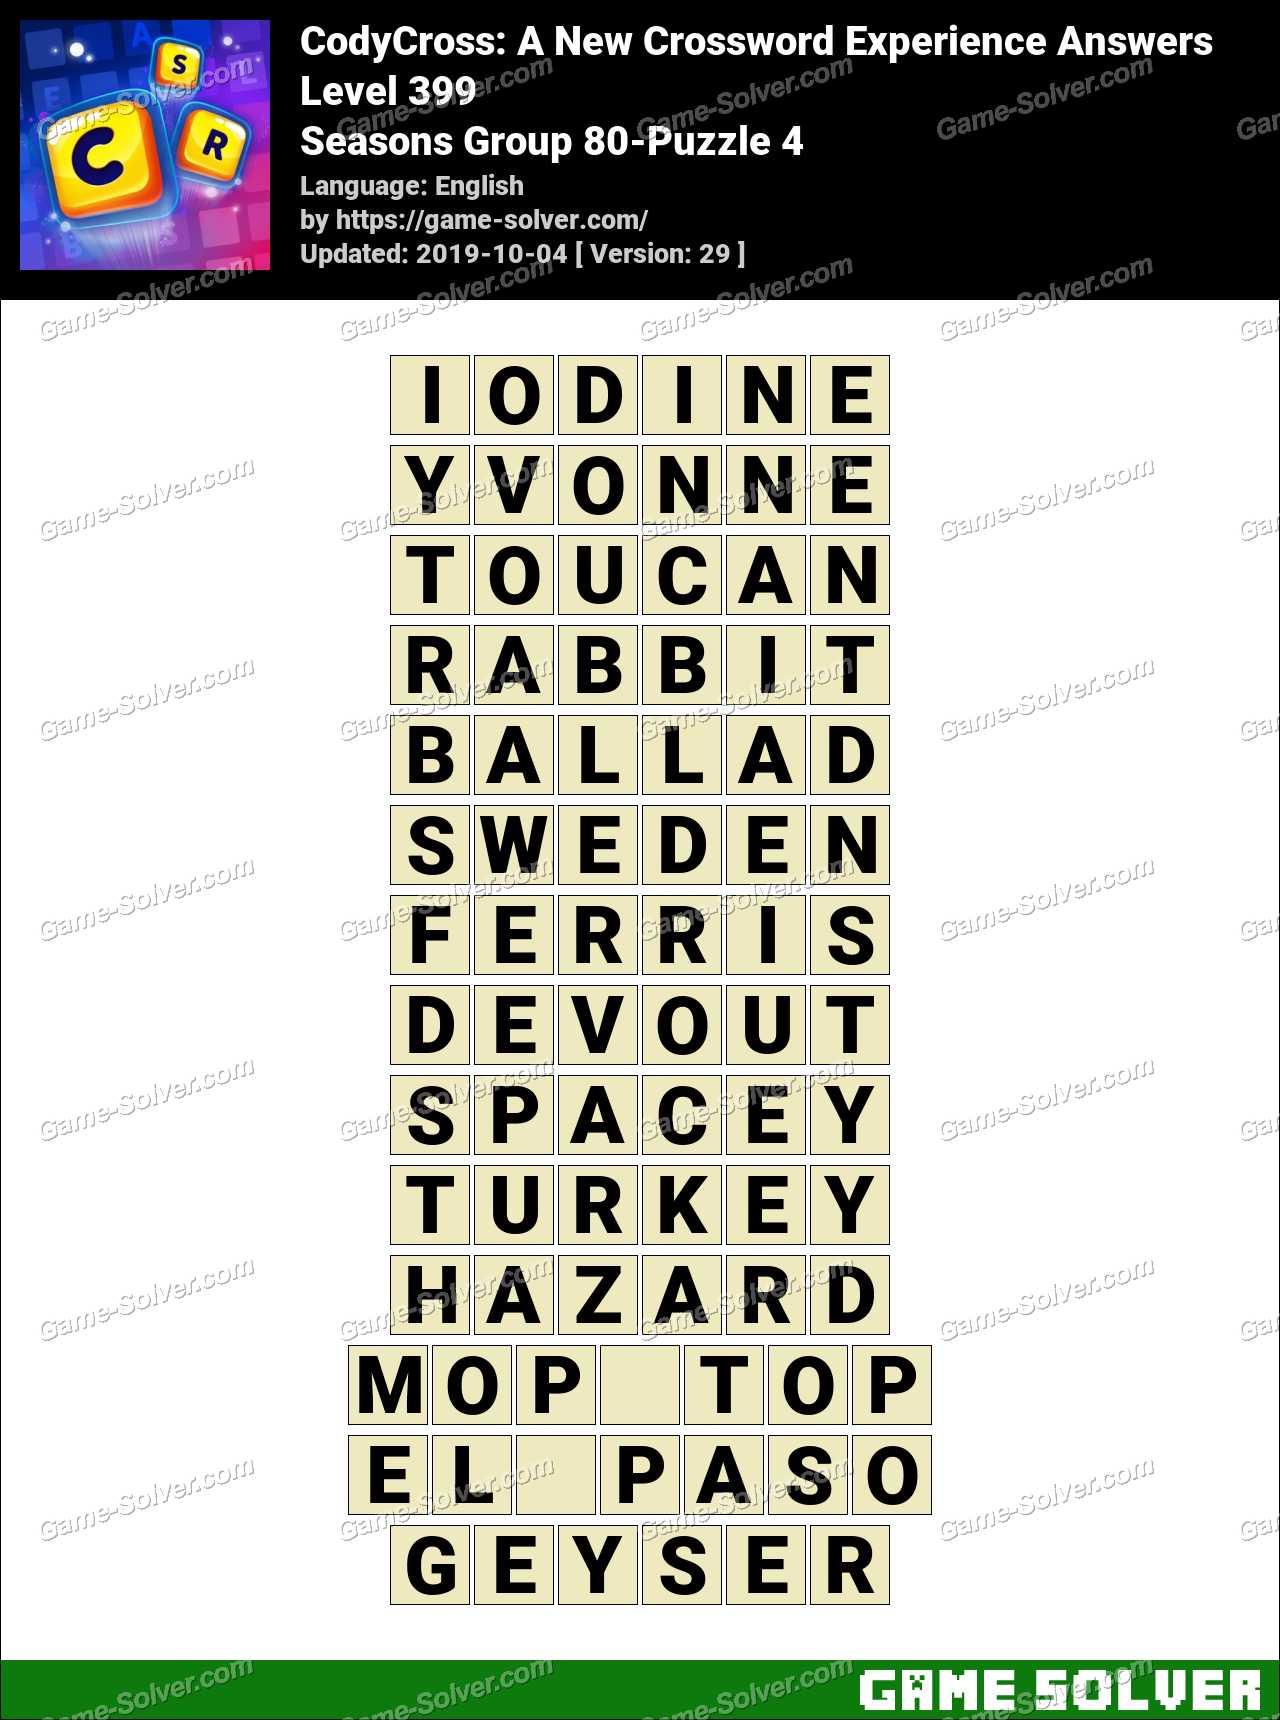 CodyCross Seasons Group 80-Puzzle 4 Answers